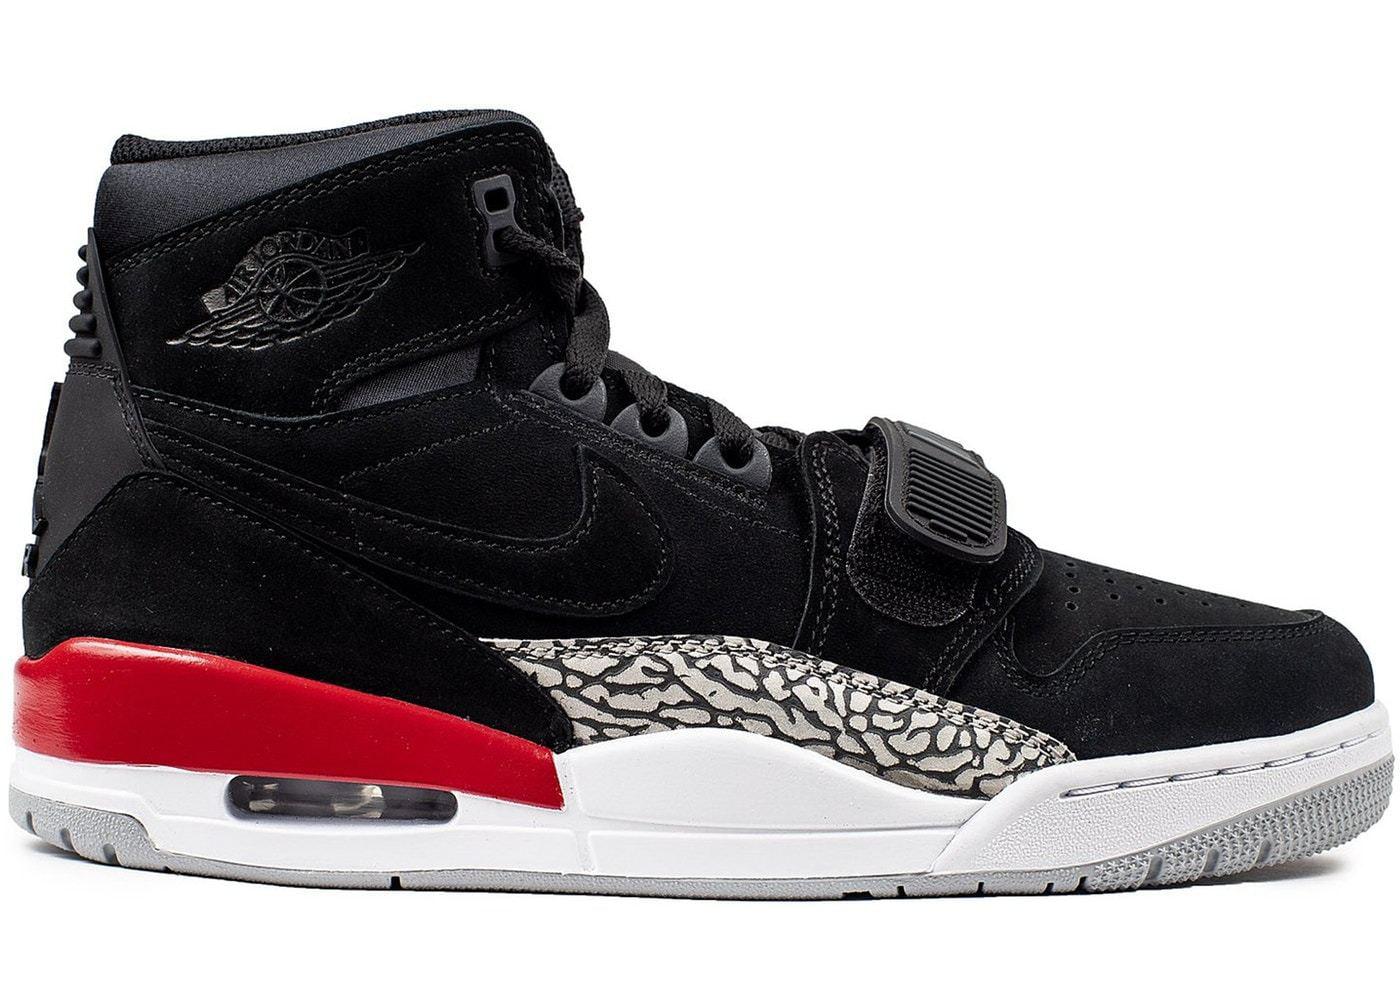 Mens Air Jordan Legacy 312 Black Suede